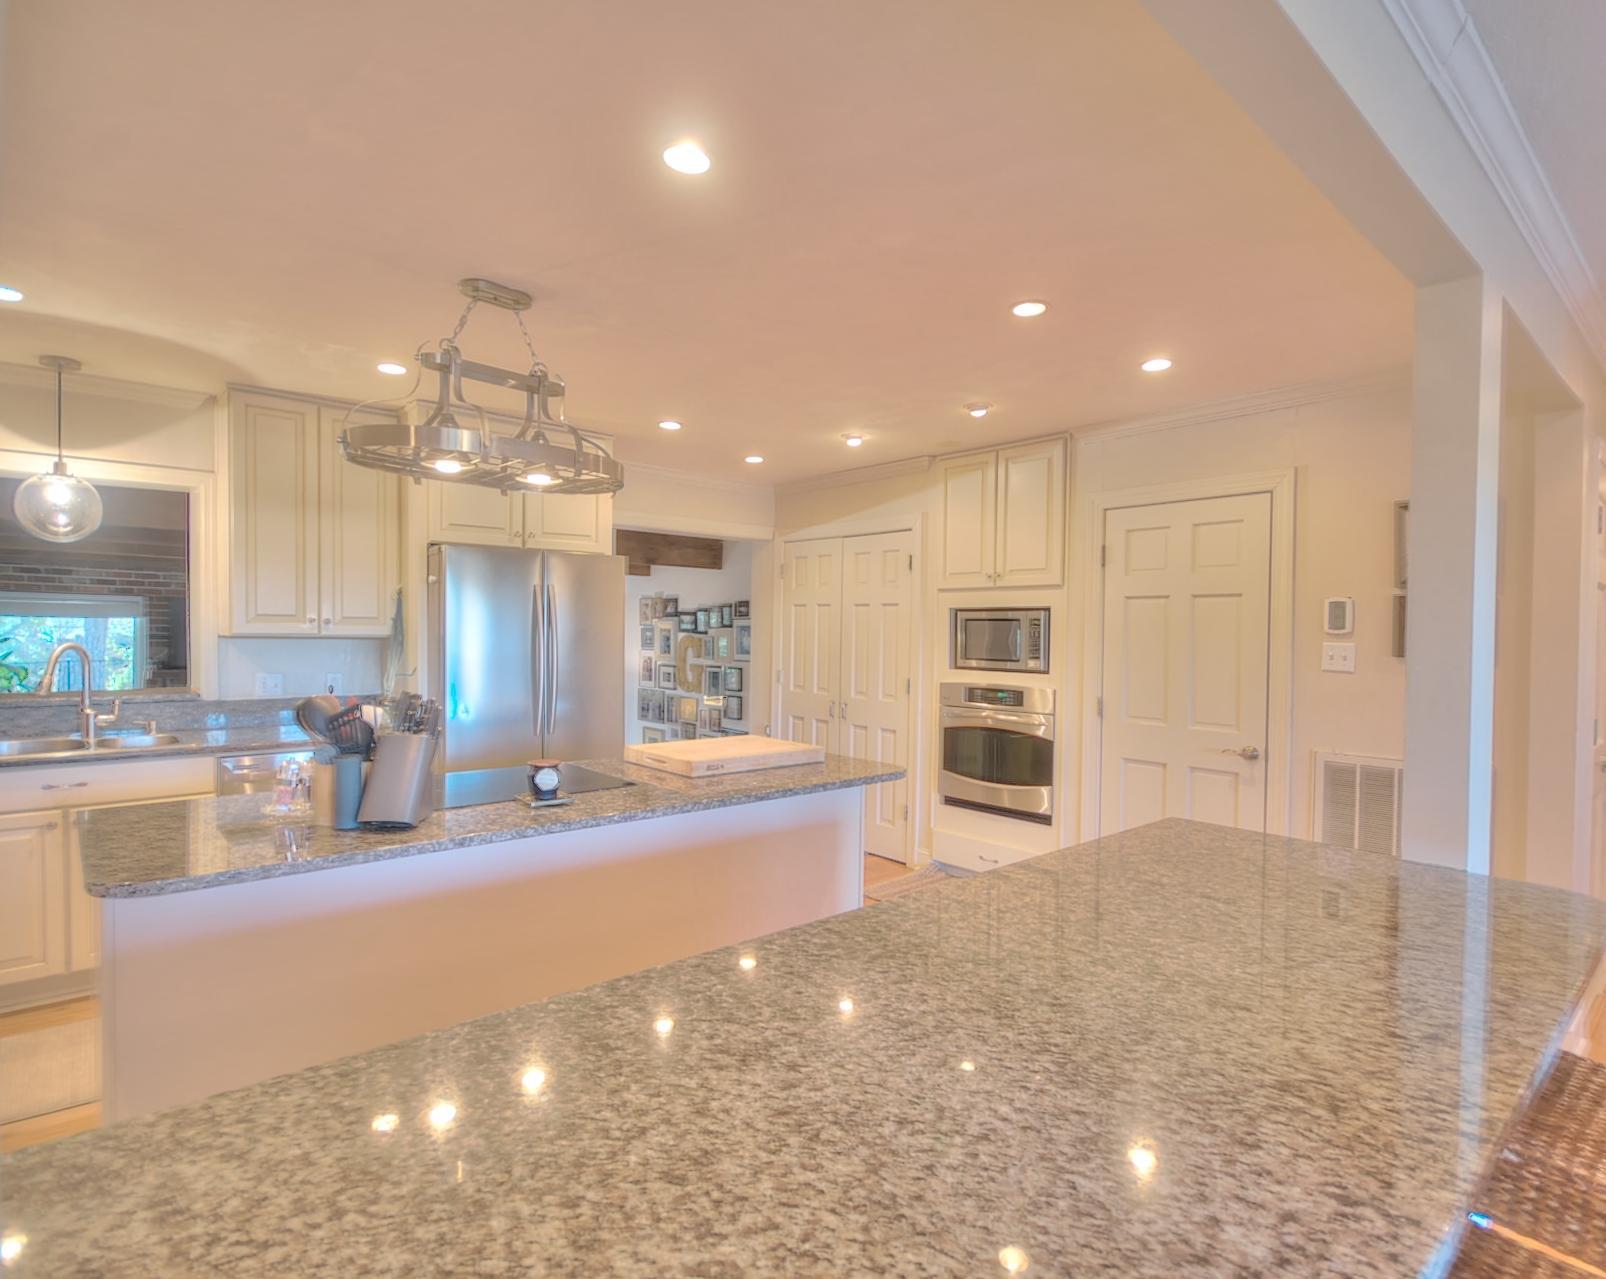 Capri Isles Homes For Sale - 213 Wappoo, Charleston, SC - 3